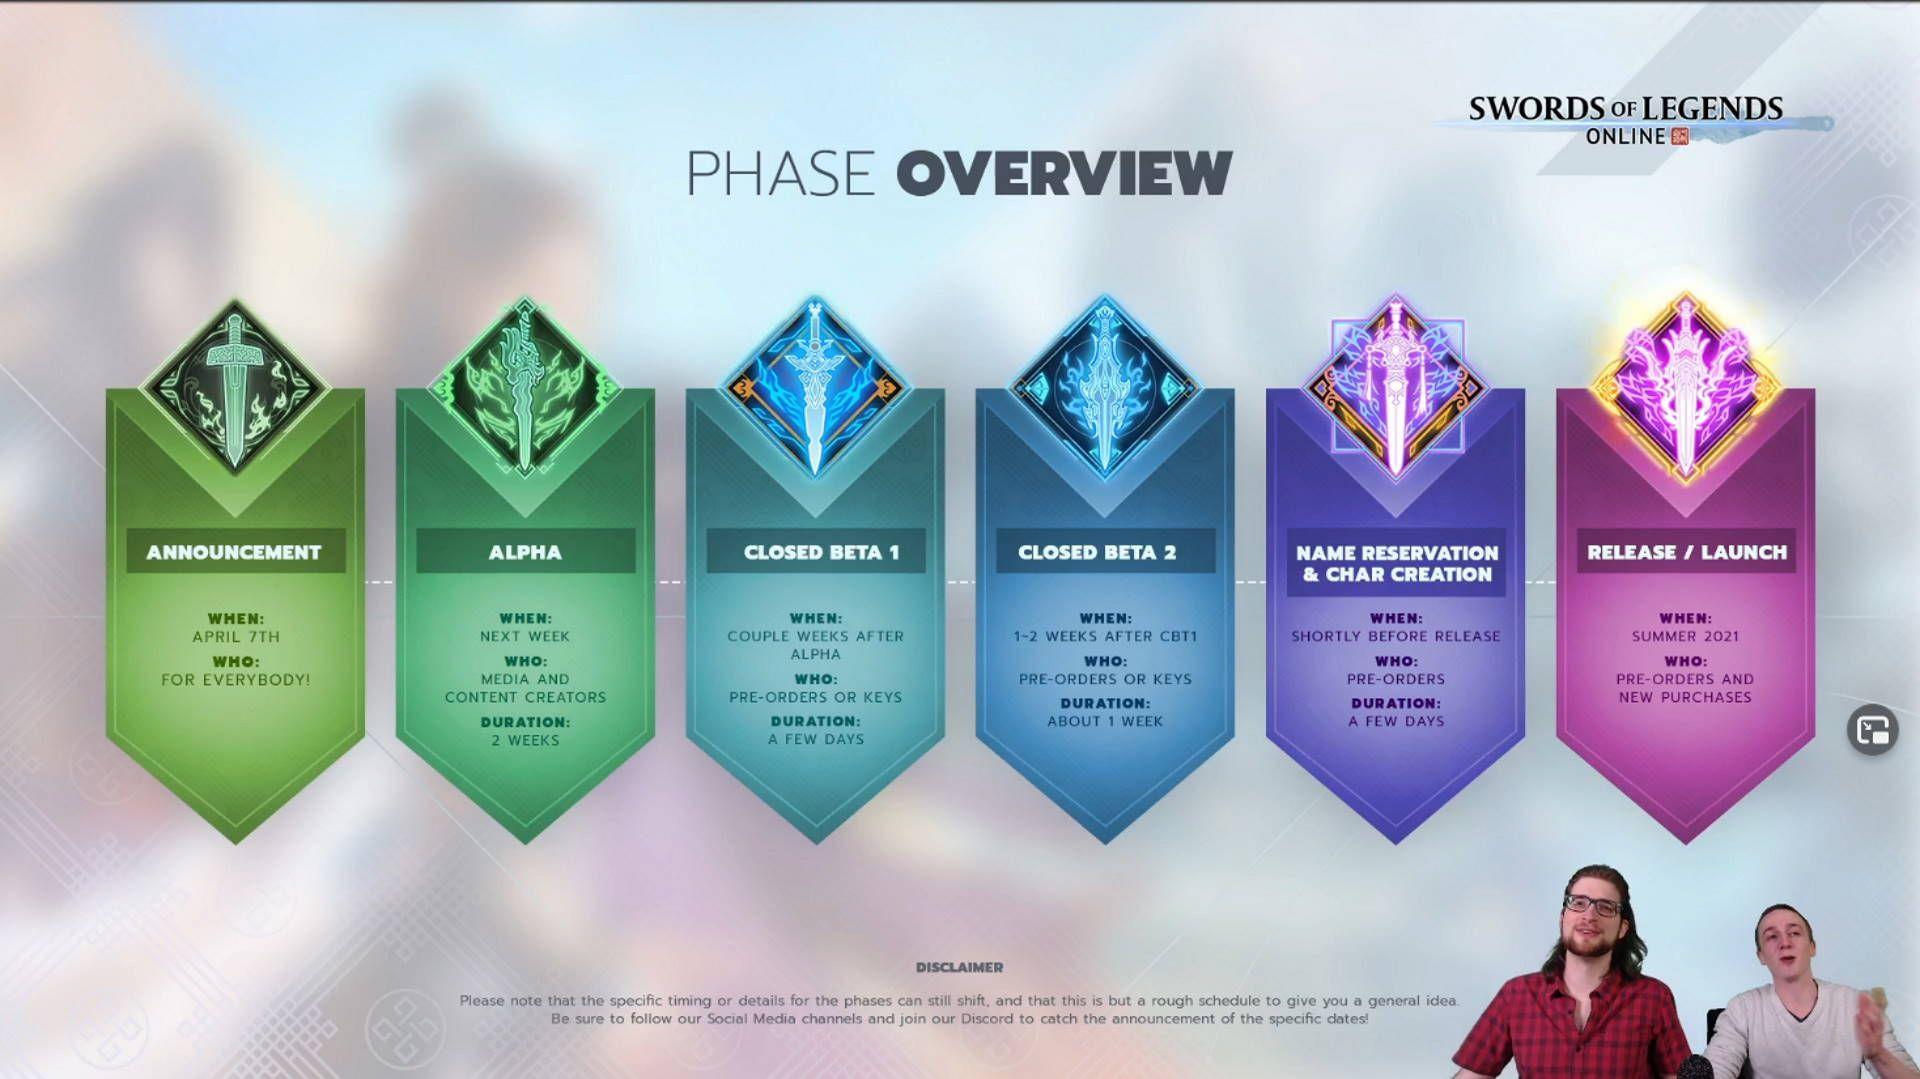 Swords of Legends Online Phase Release Roadmap